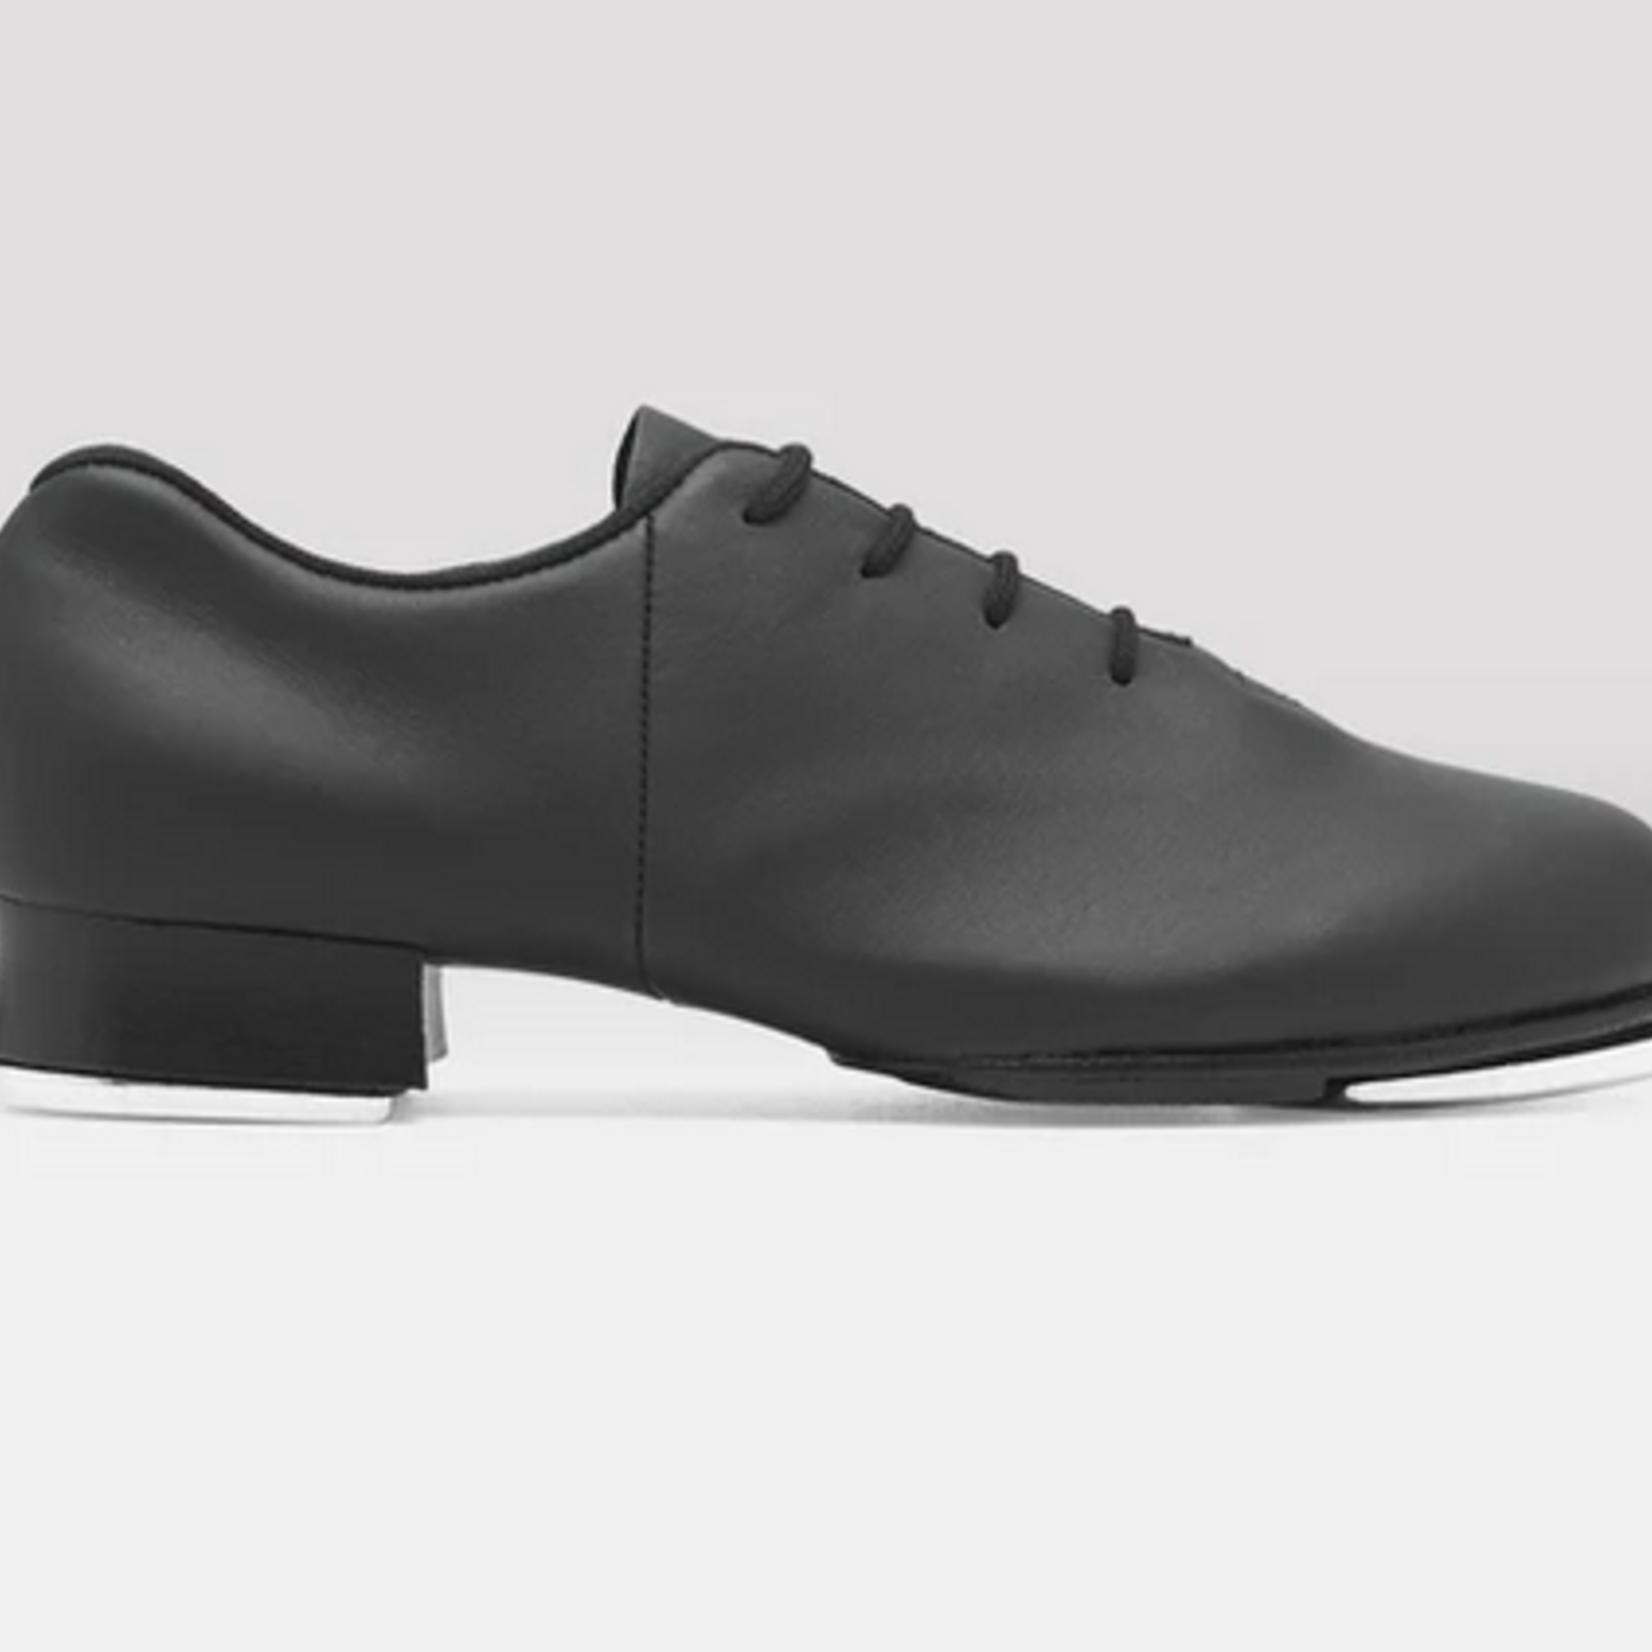 Bloch Bloch S0388G Tap-Flex Child Flexible Tap Shoe